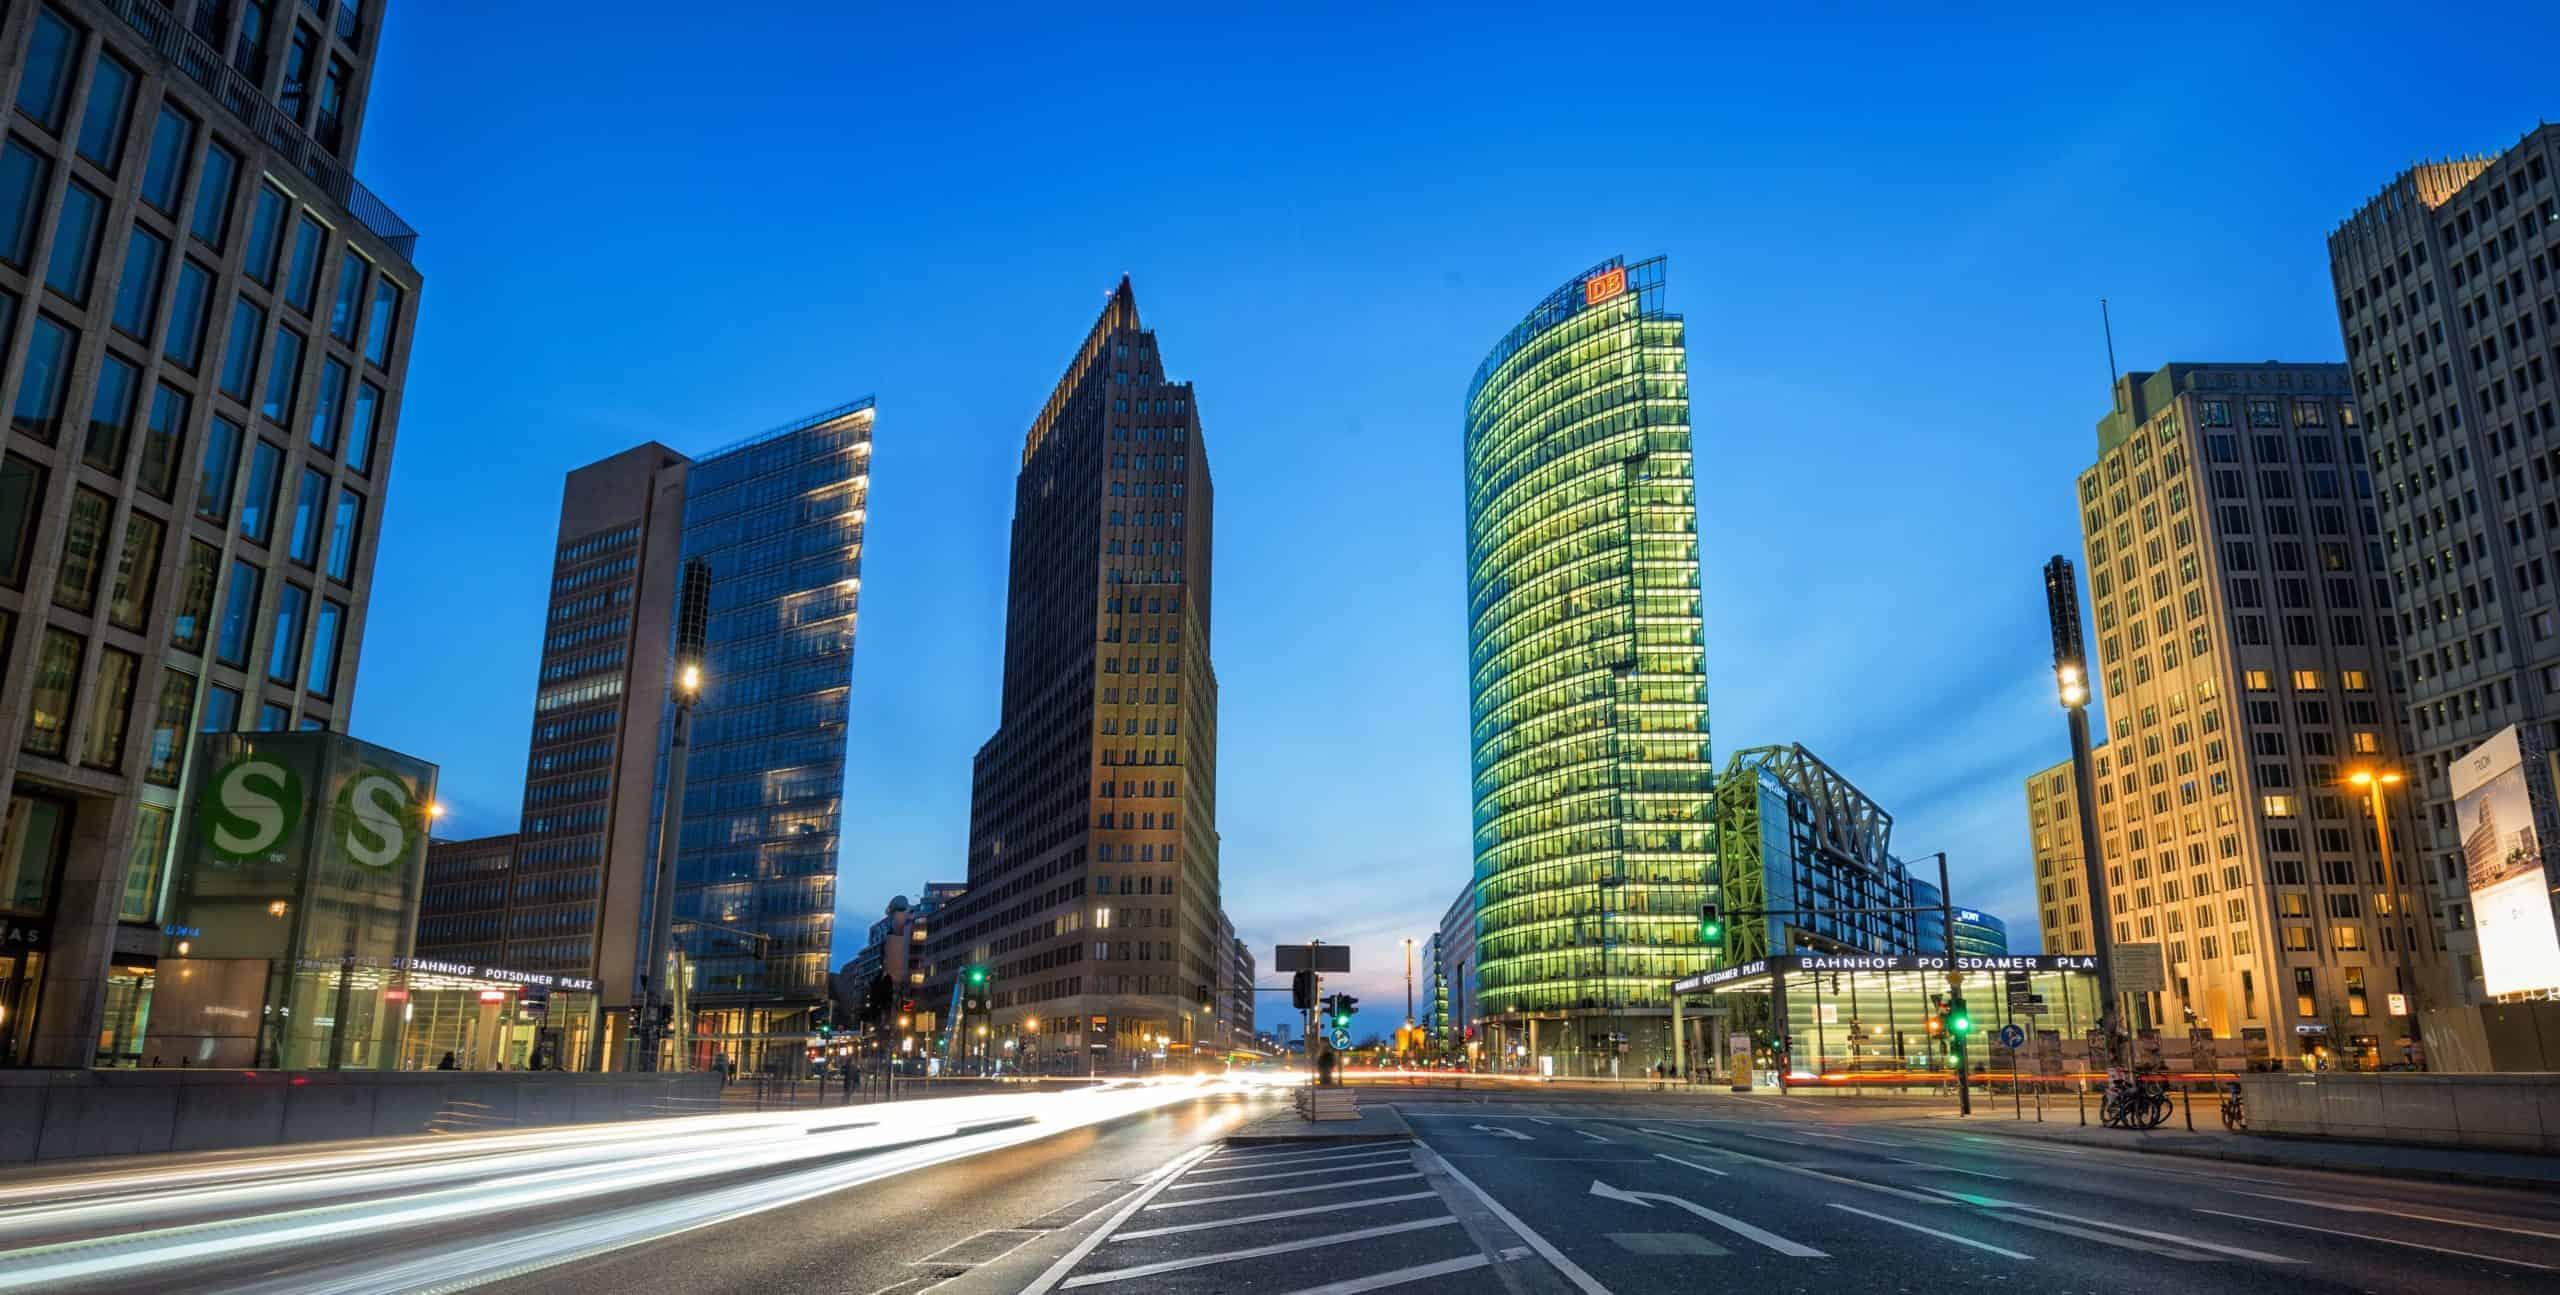 adamma single family office berlin frankfurt hotel